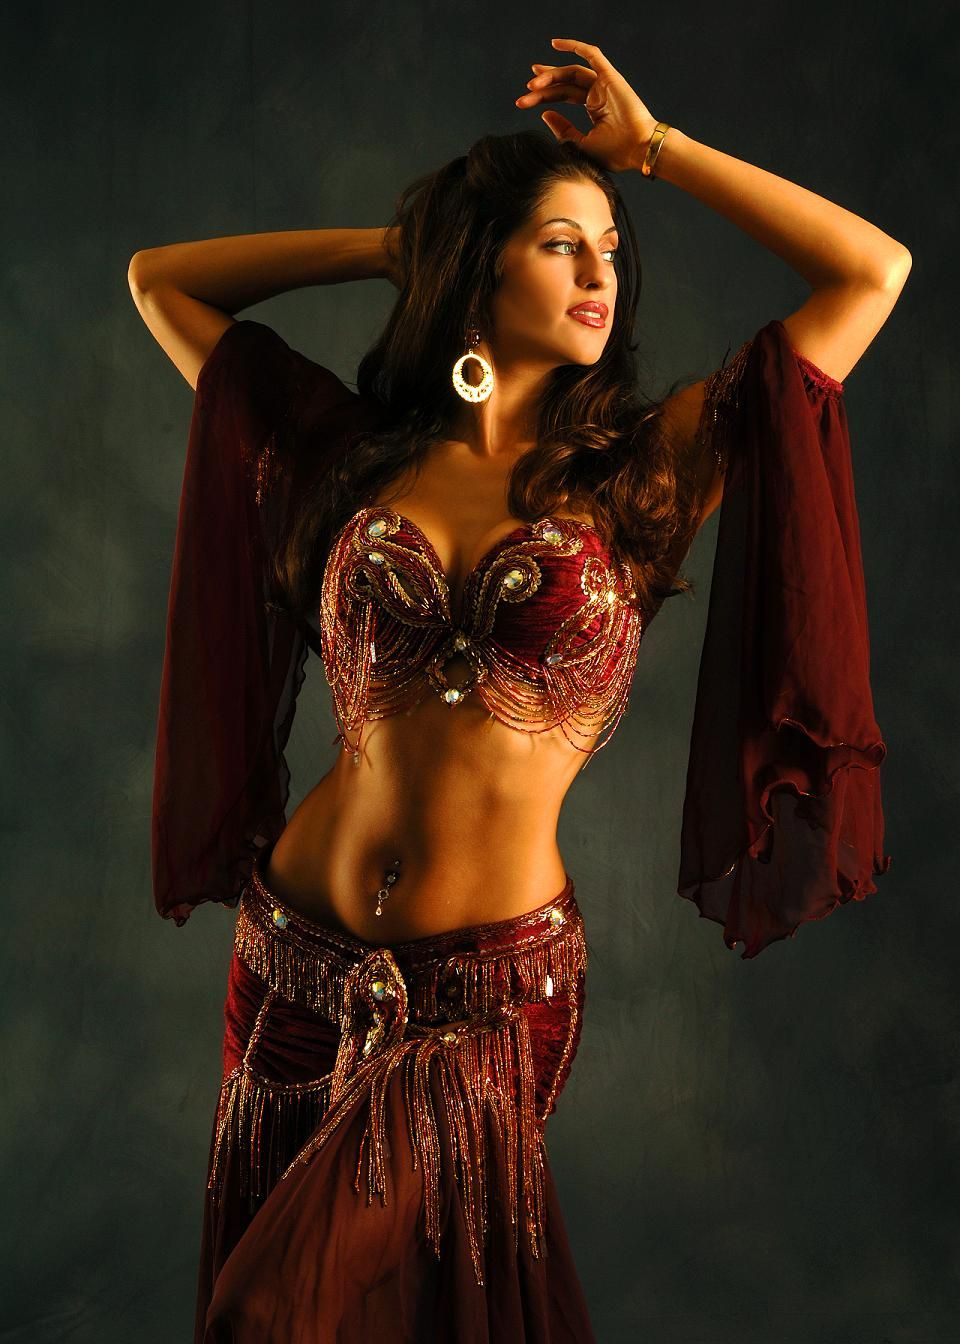 Arabian dancer vids